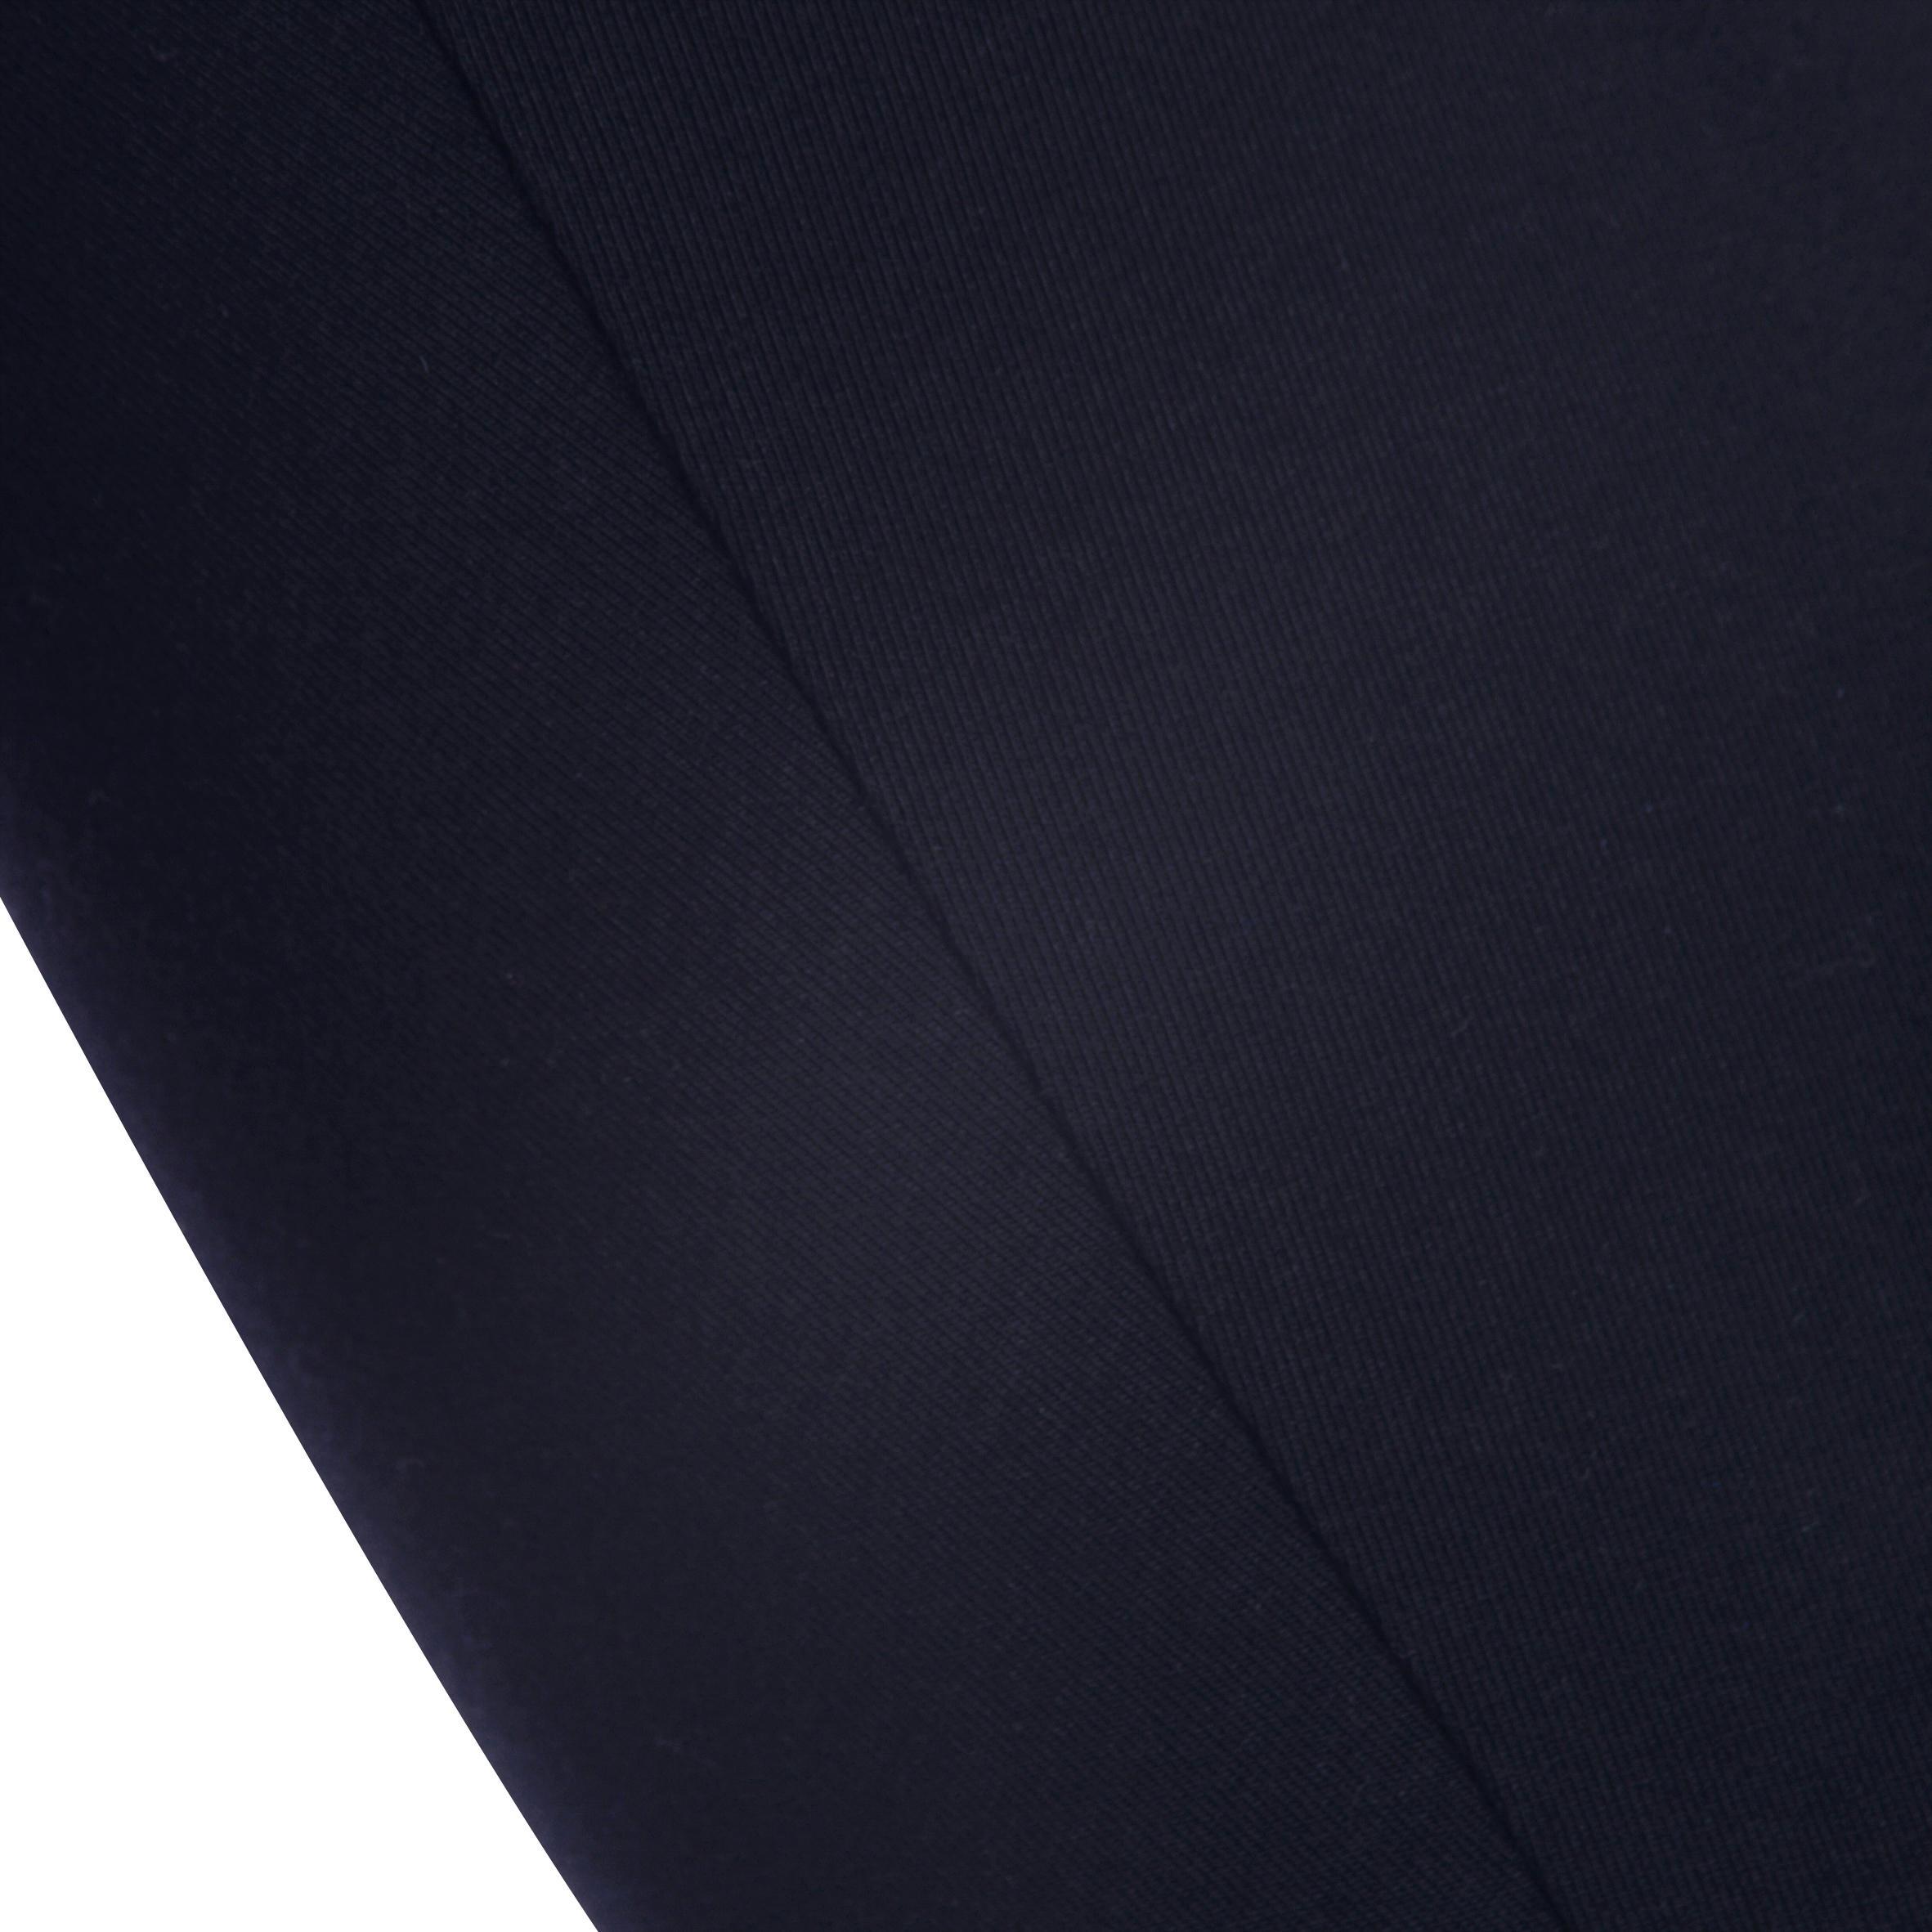 Girls' Gym Leggings - Black